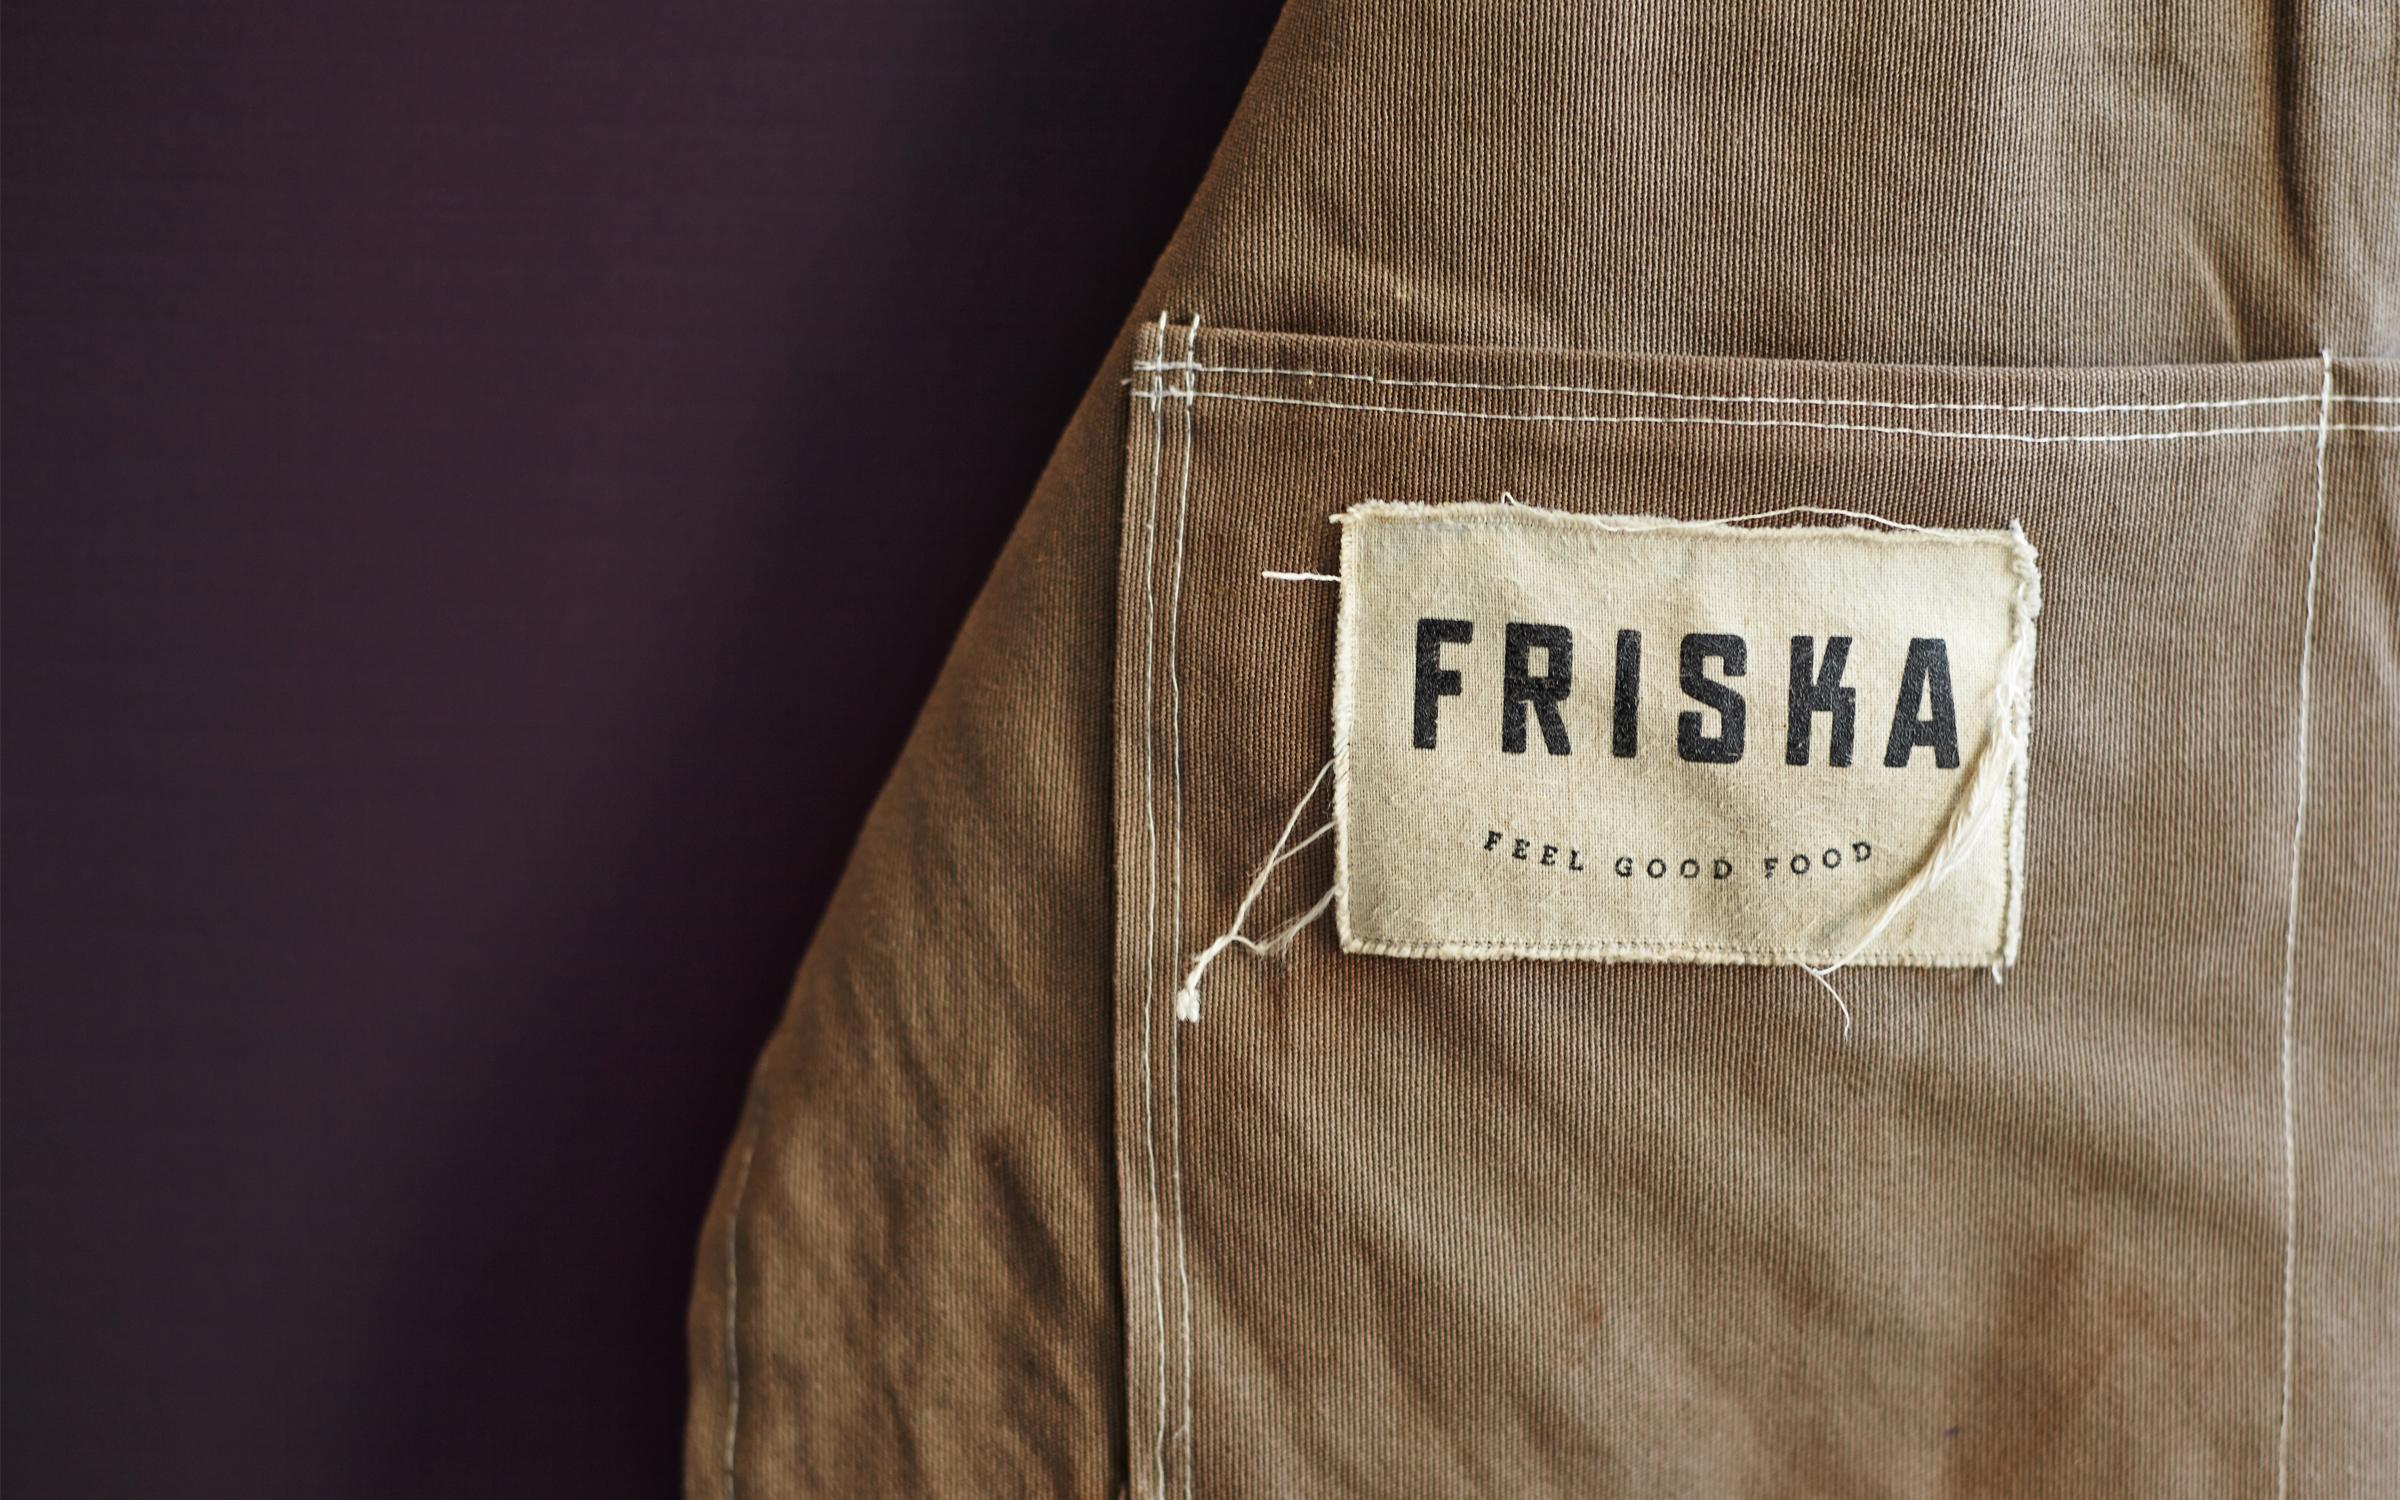 friska logo apron branding